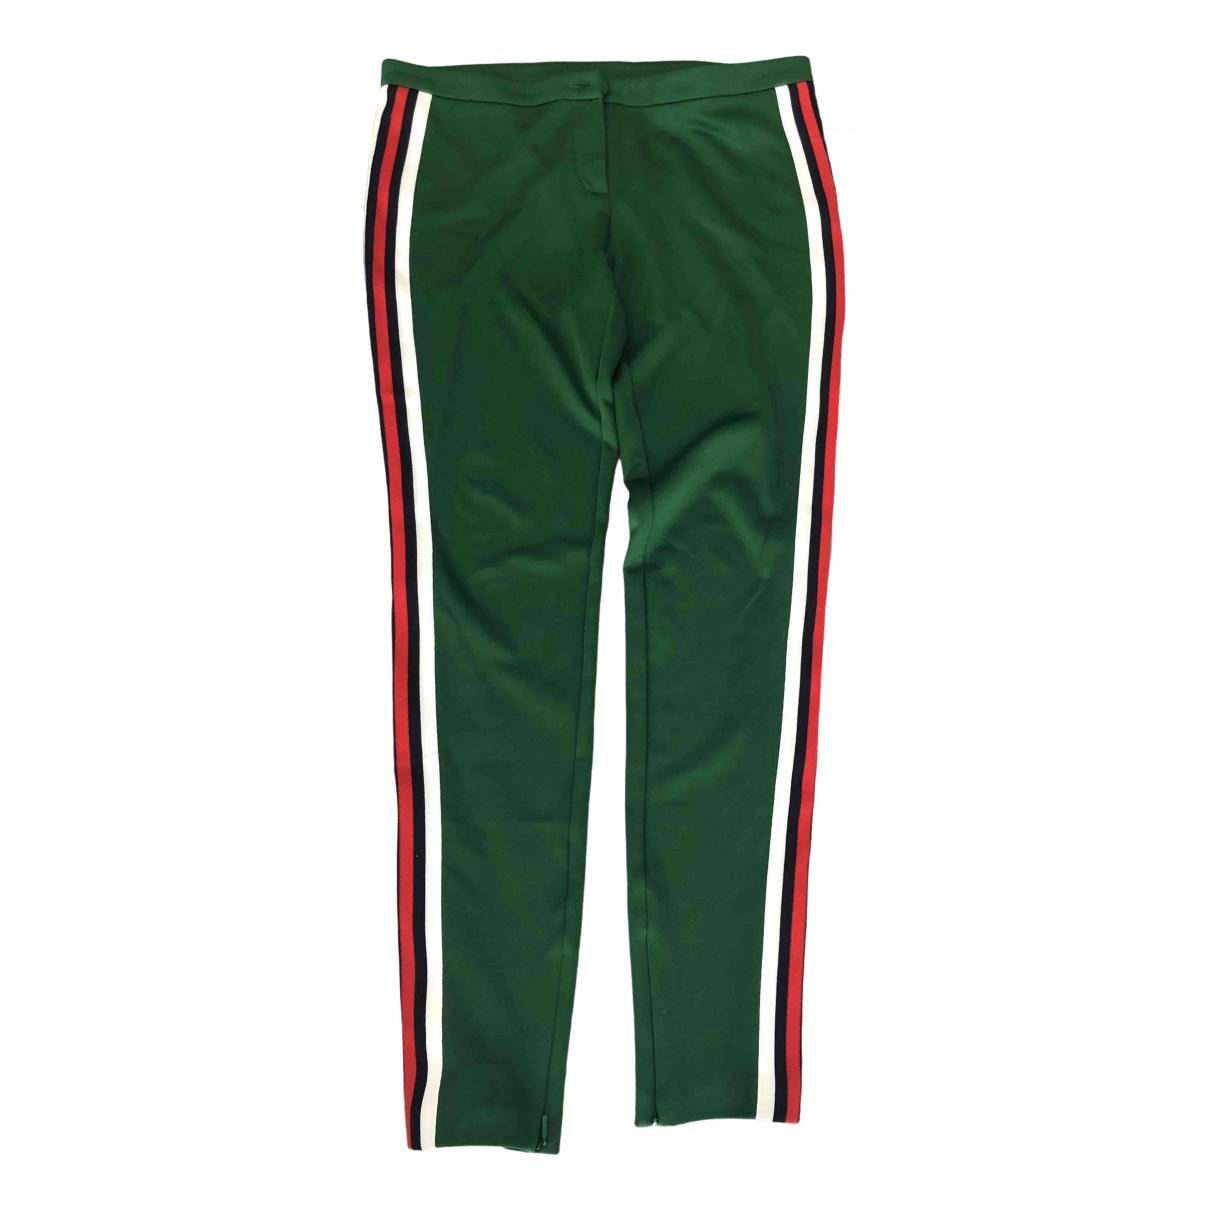 Gucci \N Green Trousers for Women L International